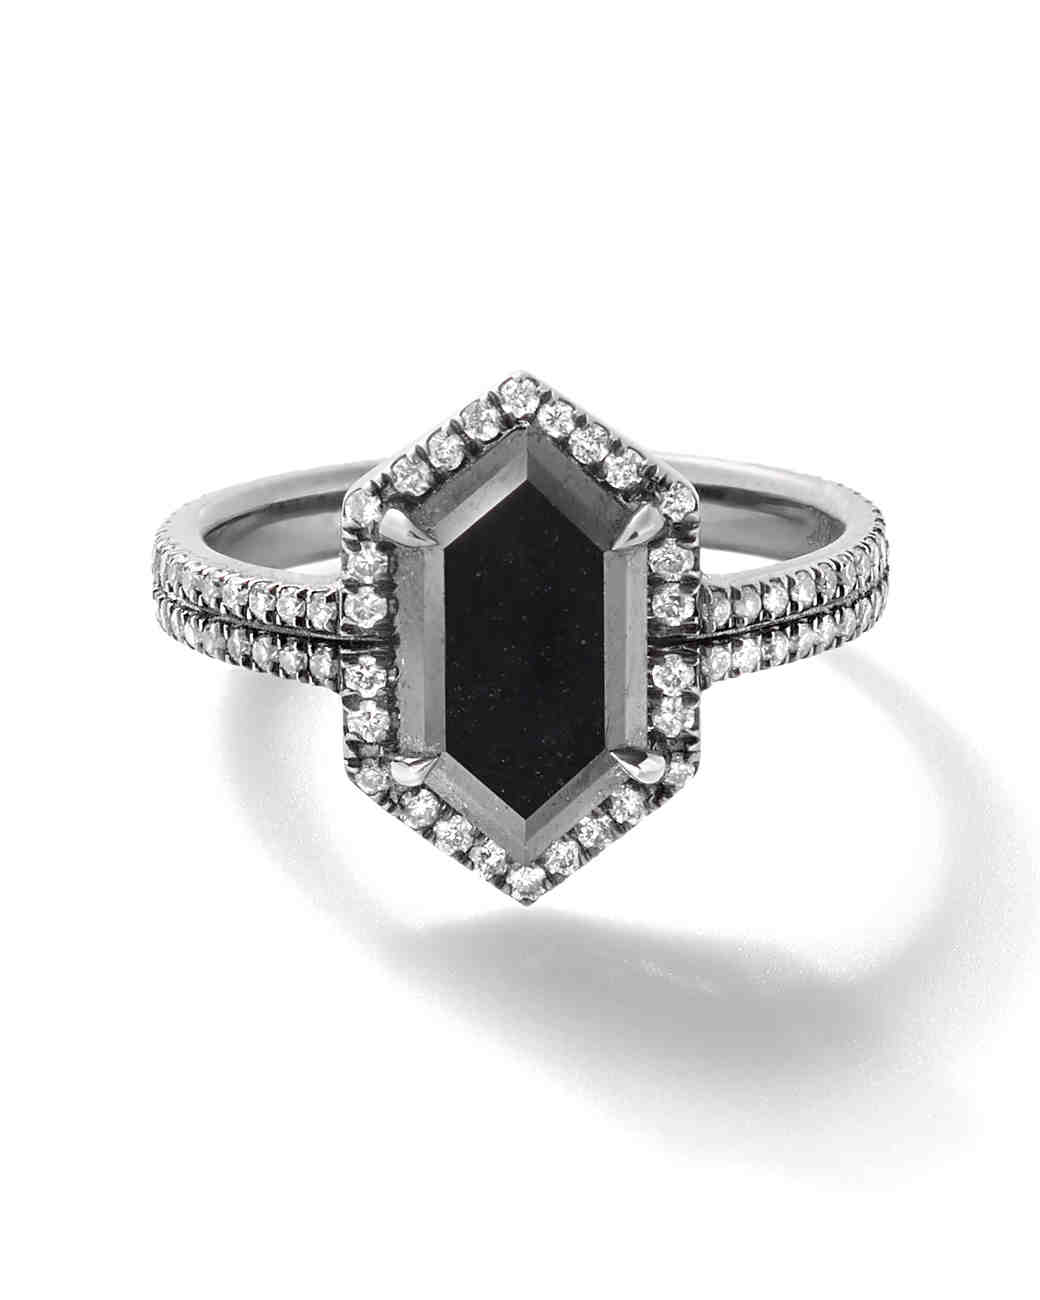 colored-engagement-rings-eva-fehren-black-diamond-0316.jpg